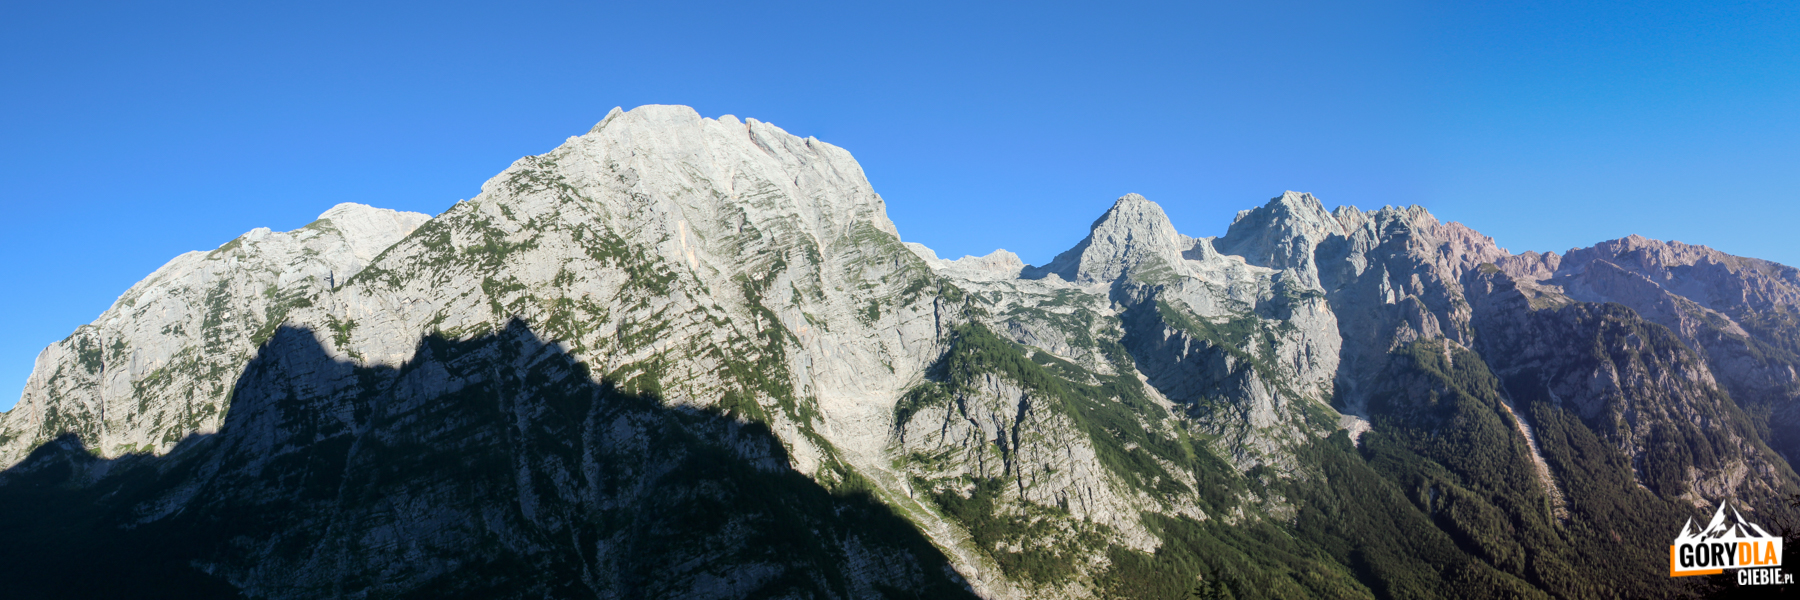 "Panorama zdrogi ""Tominškova pot"" naprzeciwległą stronę Doliny Vrata - Stenar (2502 m), Dolkova špica (2591 m) iŠkrlatica (2740 m)"